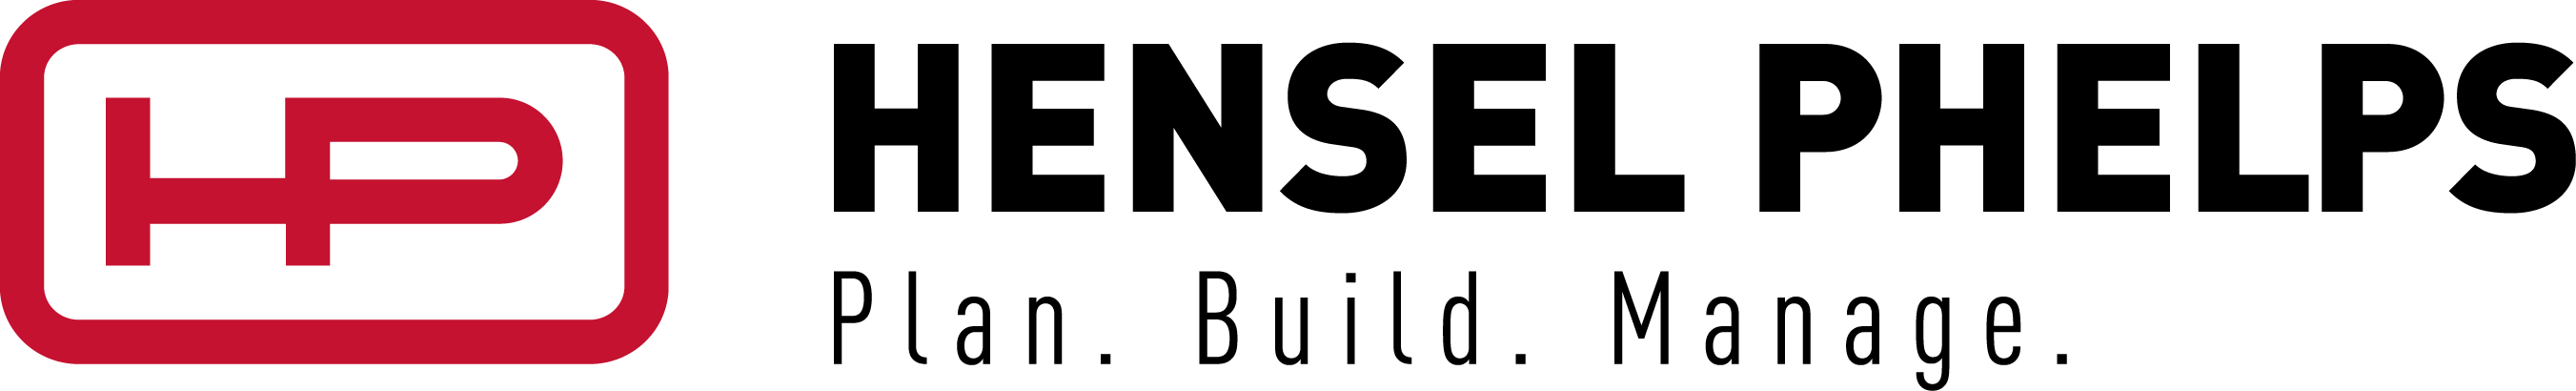 Hensel Phelps logo